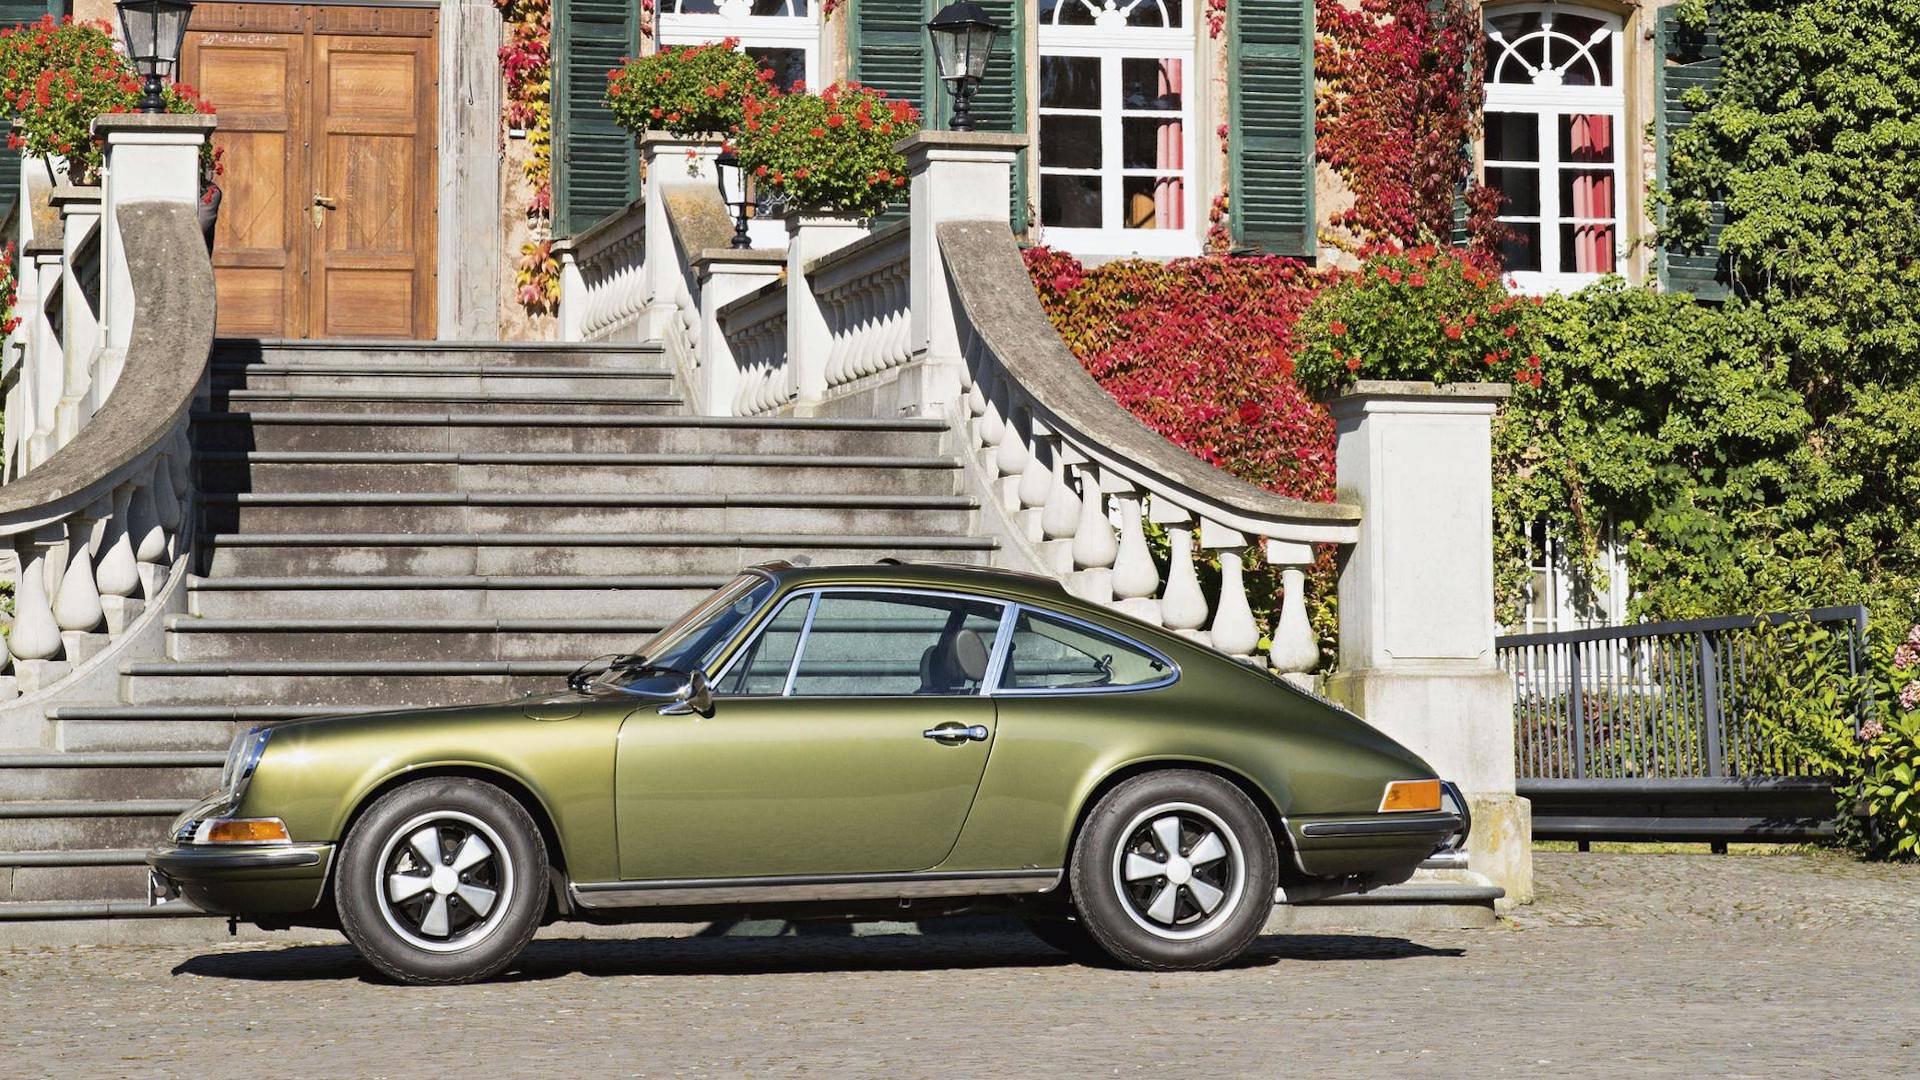 Ferry Porsche's Olive Green 911 Is Still Stunning, 49 Years Later on susanne porsche, erwin komenda, ferdinand oliver porsche, ferdinand alexander porsche, porsche family, zell am see, franz josef popp, ferdinand porsche, siegfried marcus,